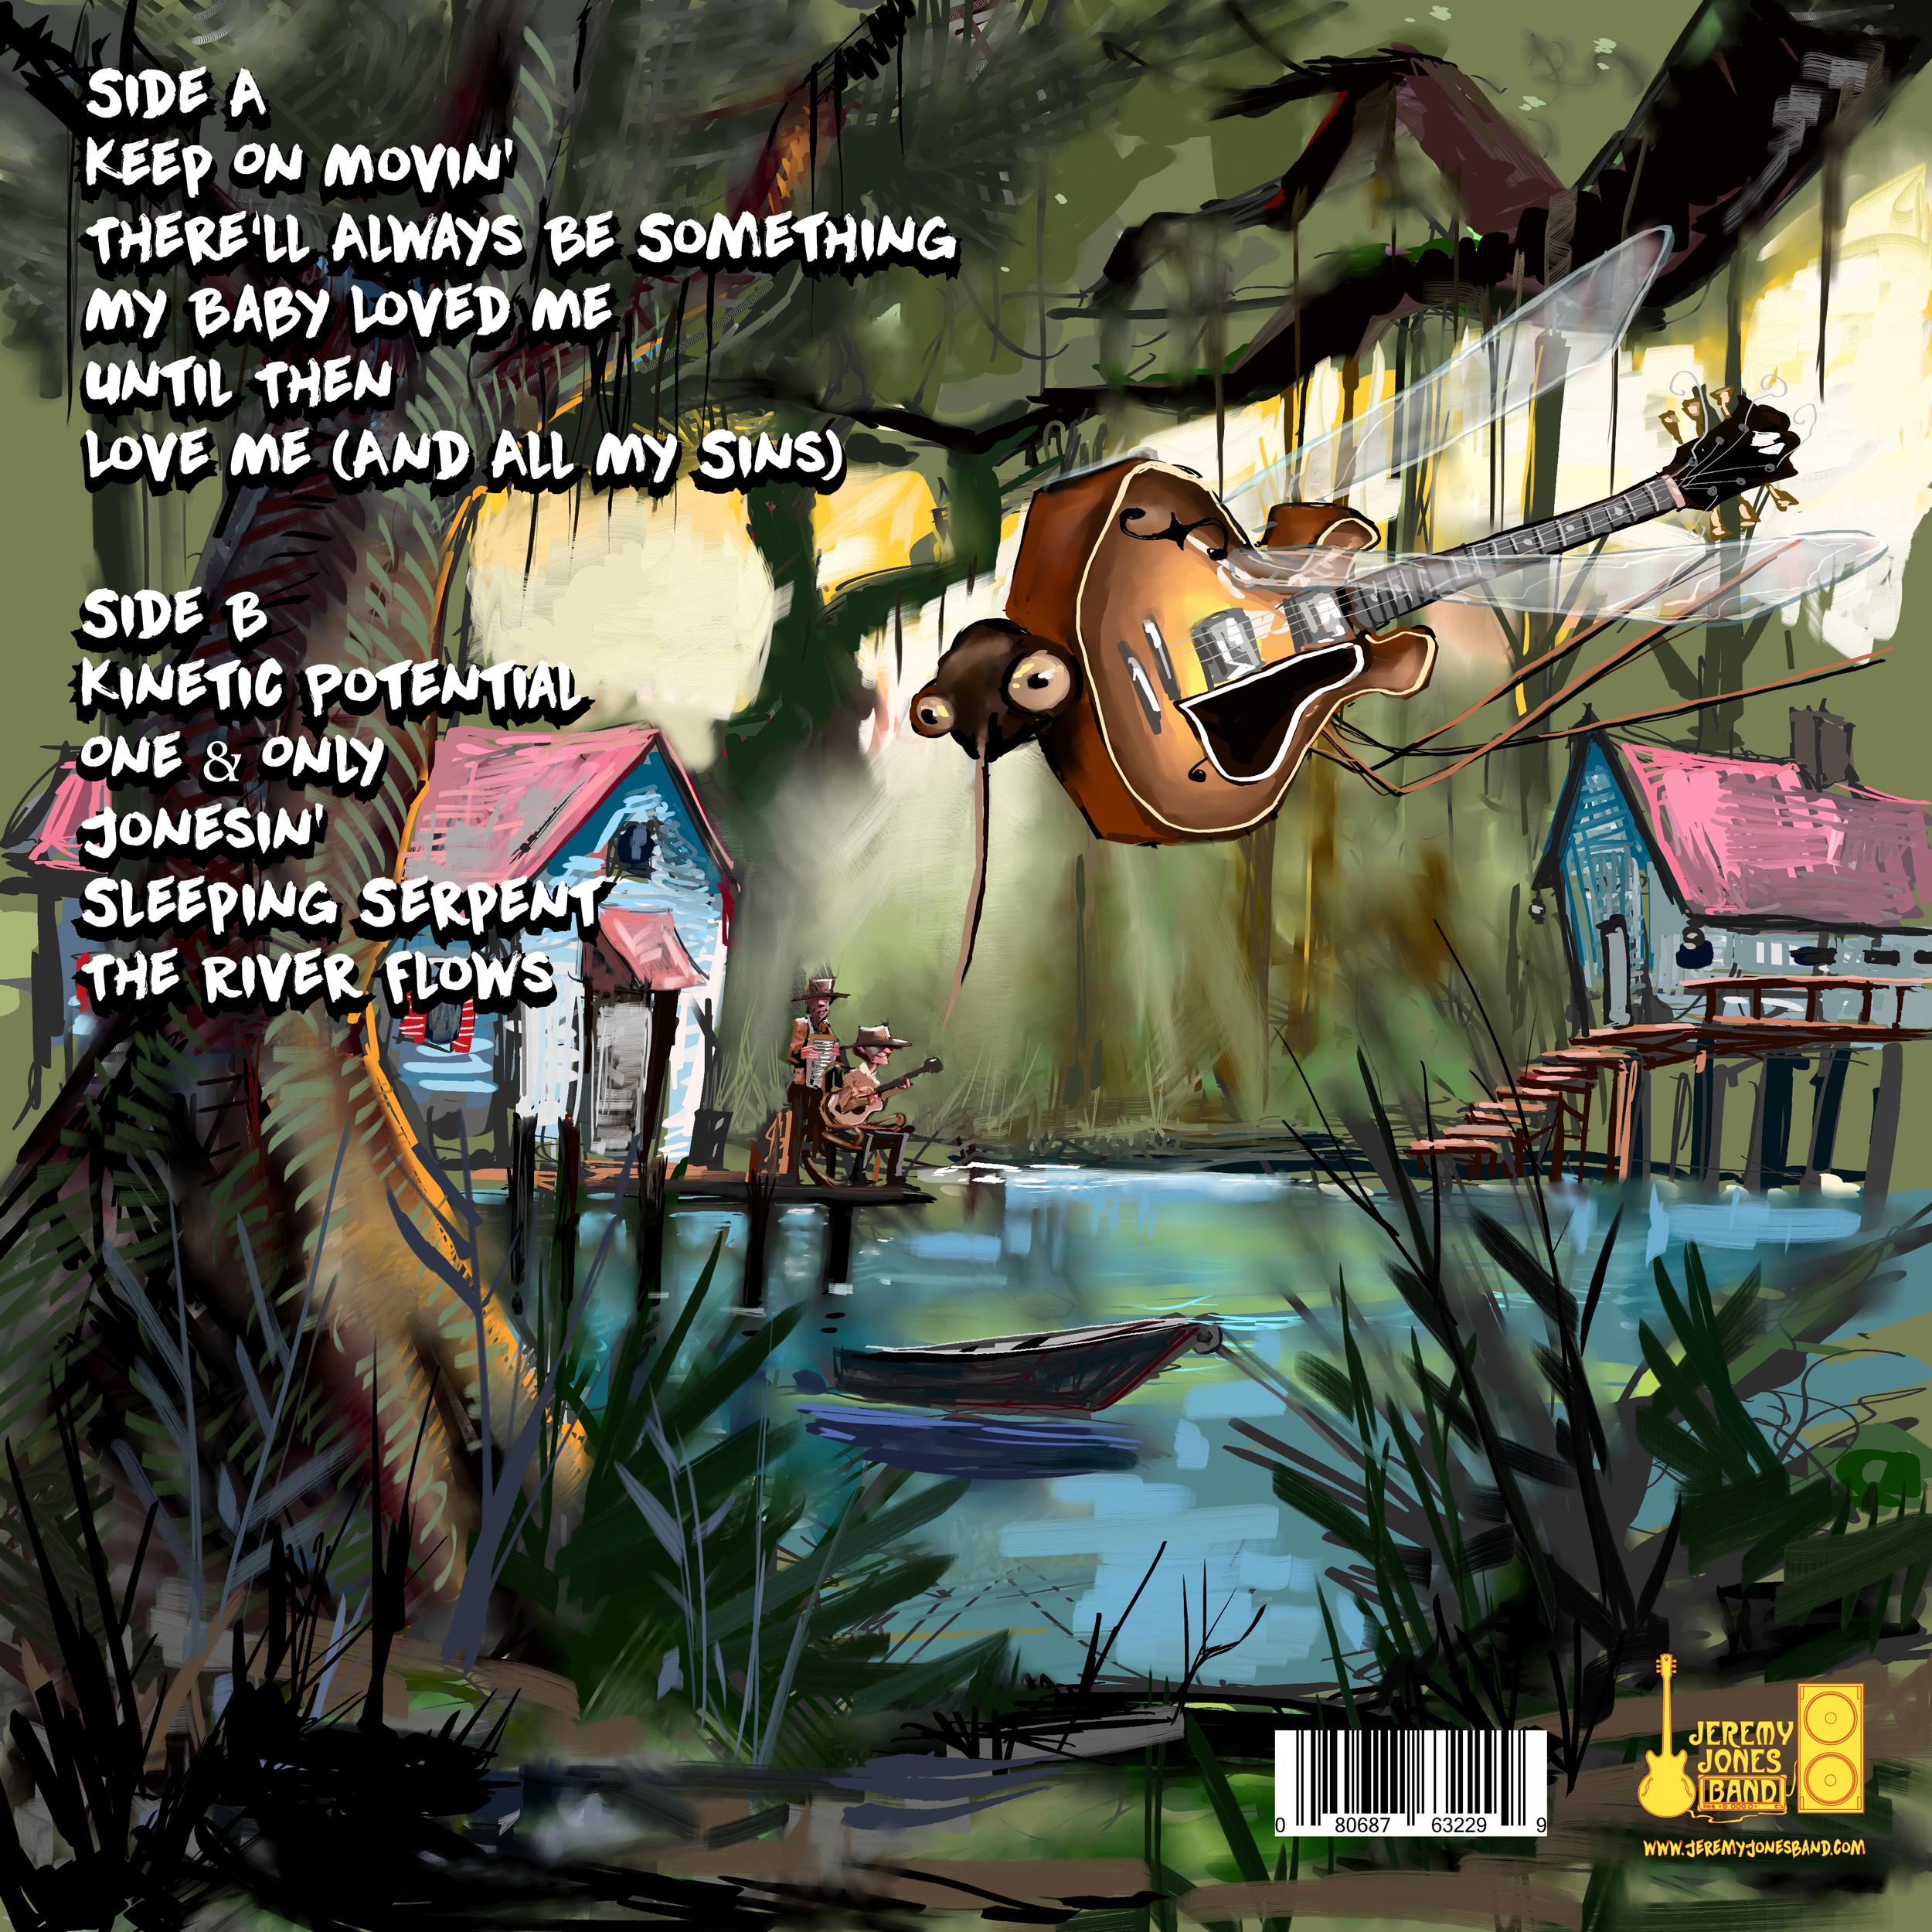 Jeremy Jones Band Album Back cover